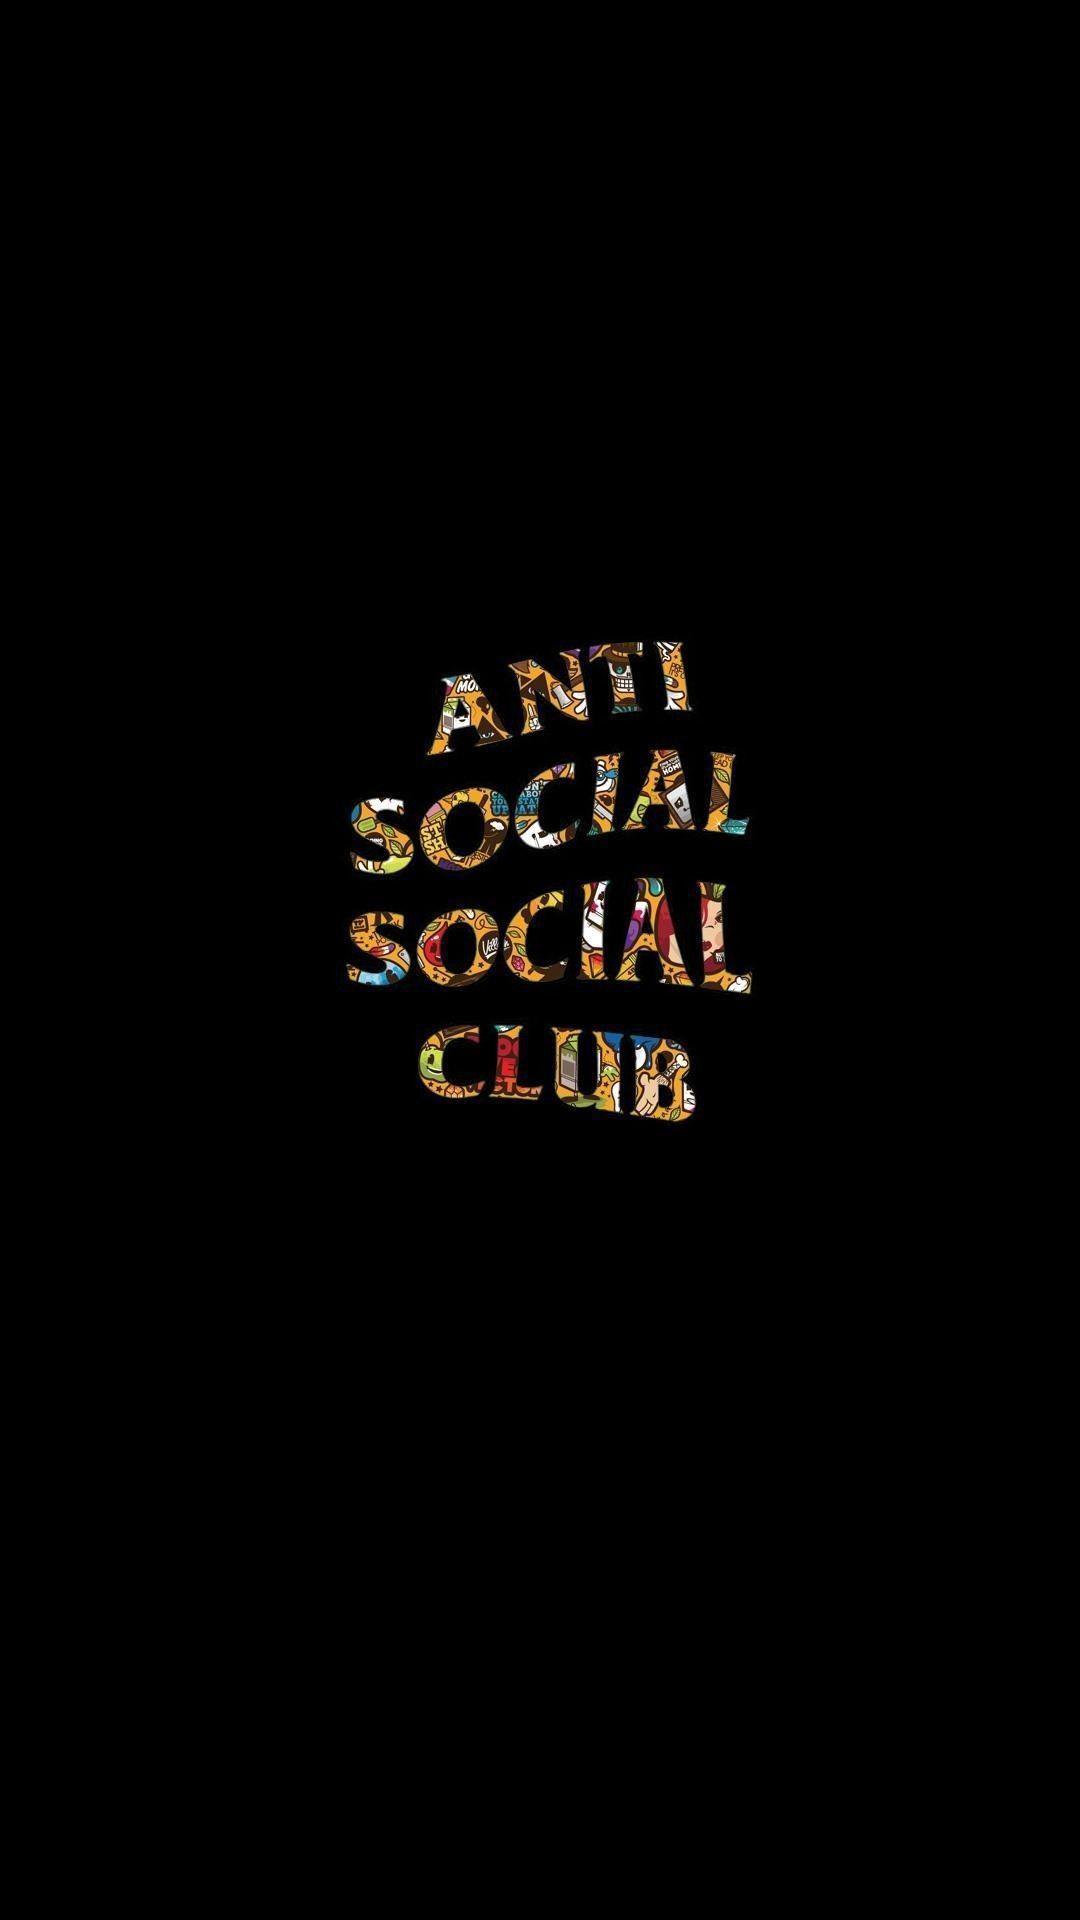 Anti Social Social Club Wallpapers - Top Free Anti Social ...